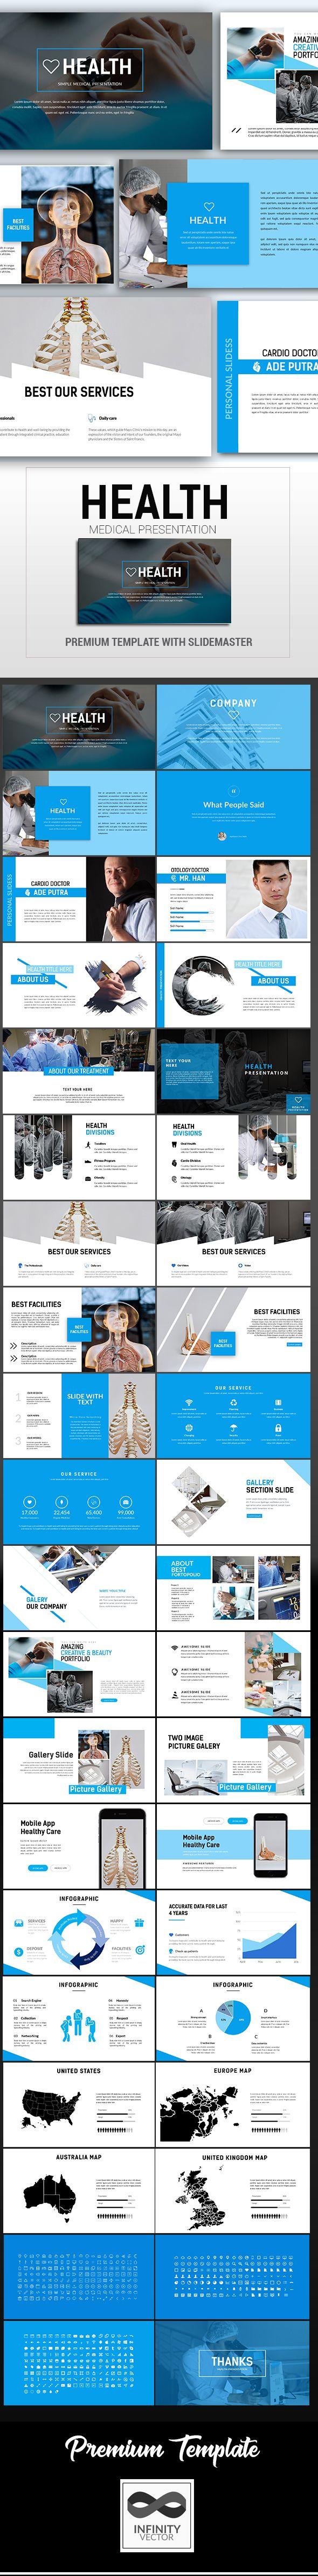 health simple medical presentation google slide - google slides, Presentation templates